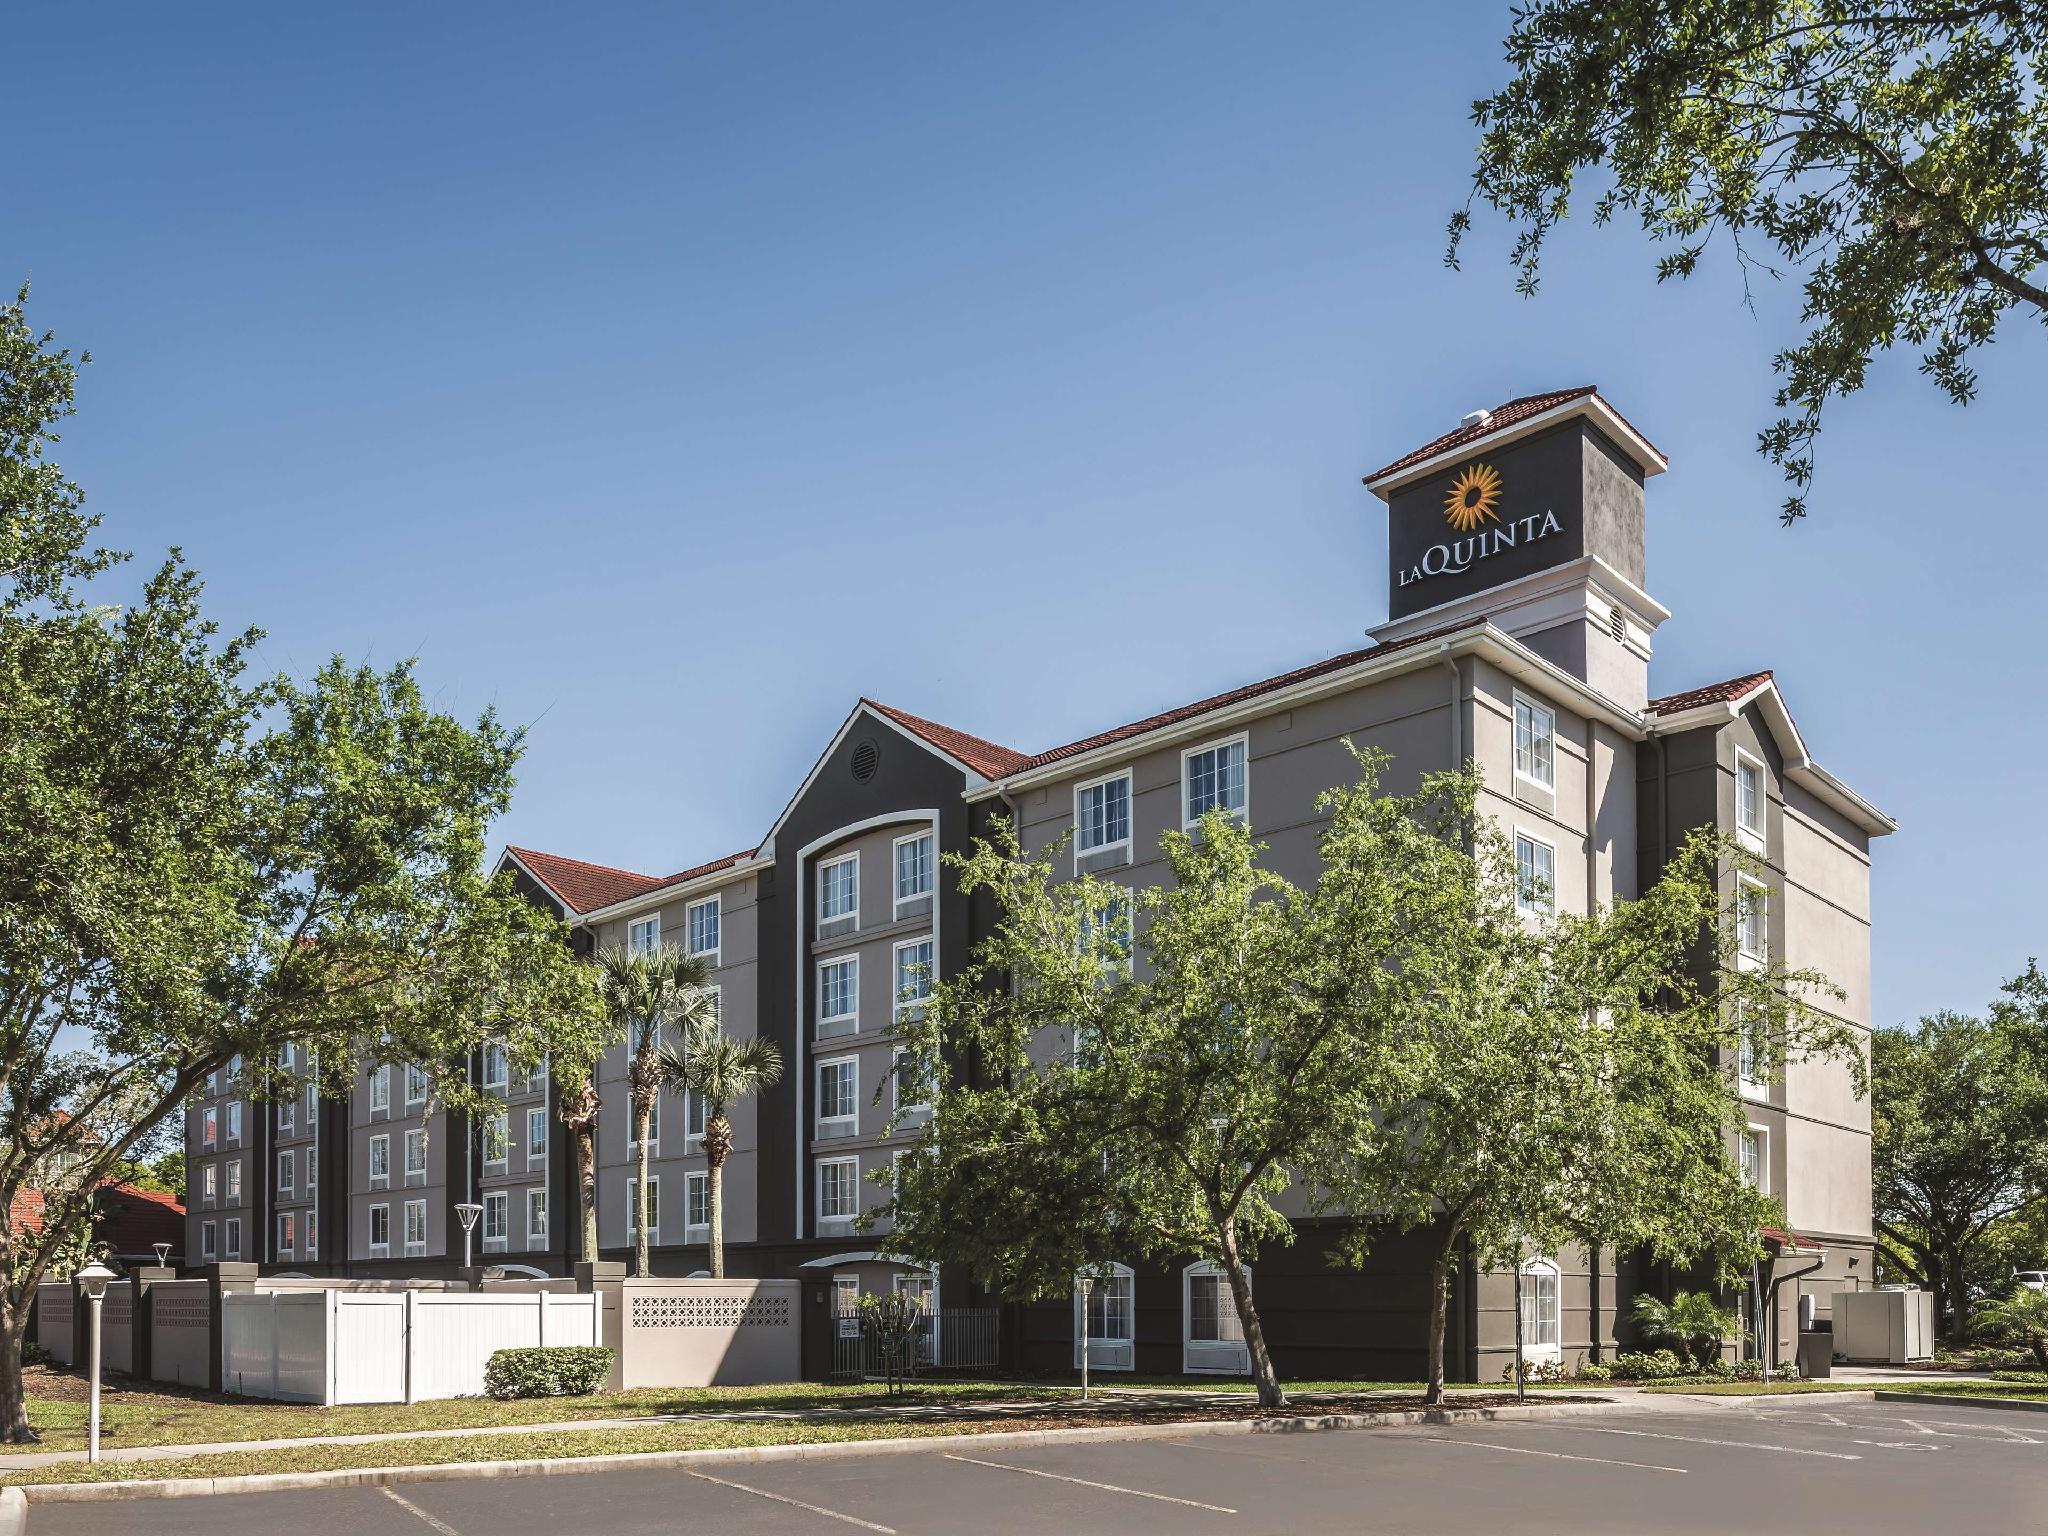 La Quinta Inn And Suites By Wyndham Orlando Lake Mary